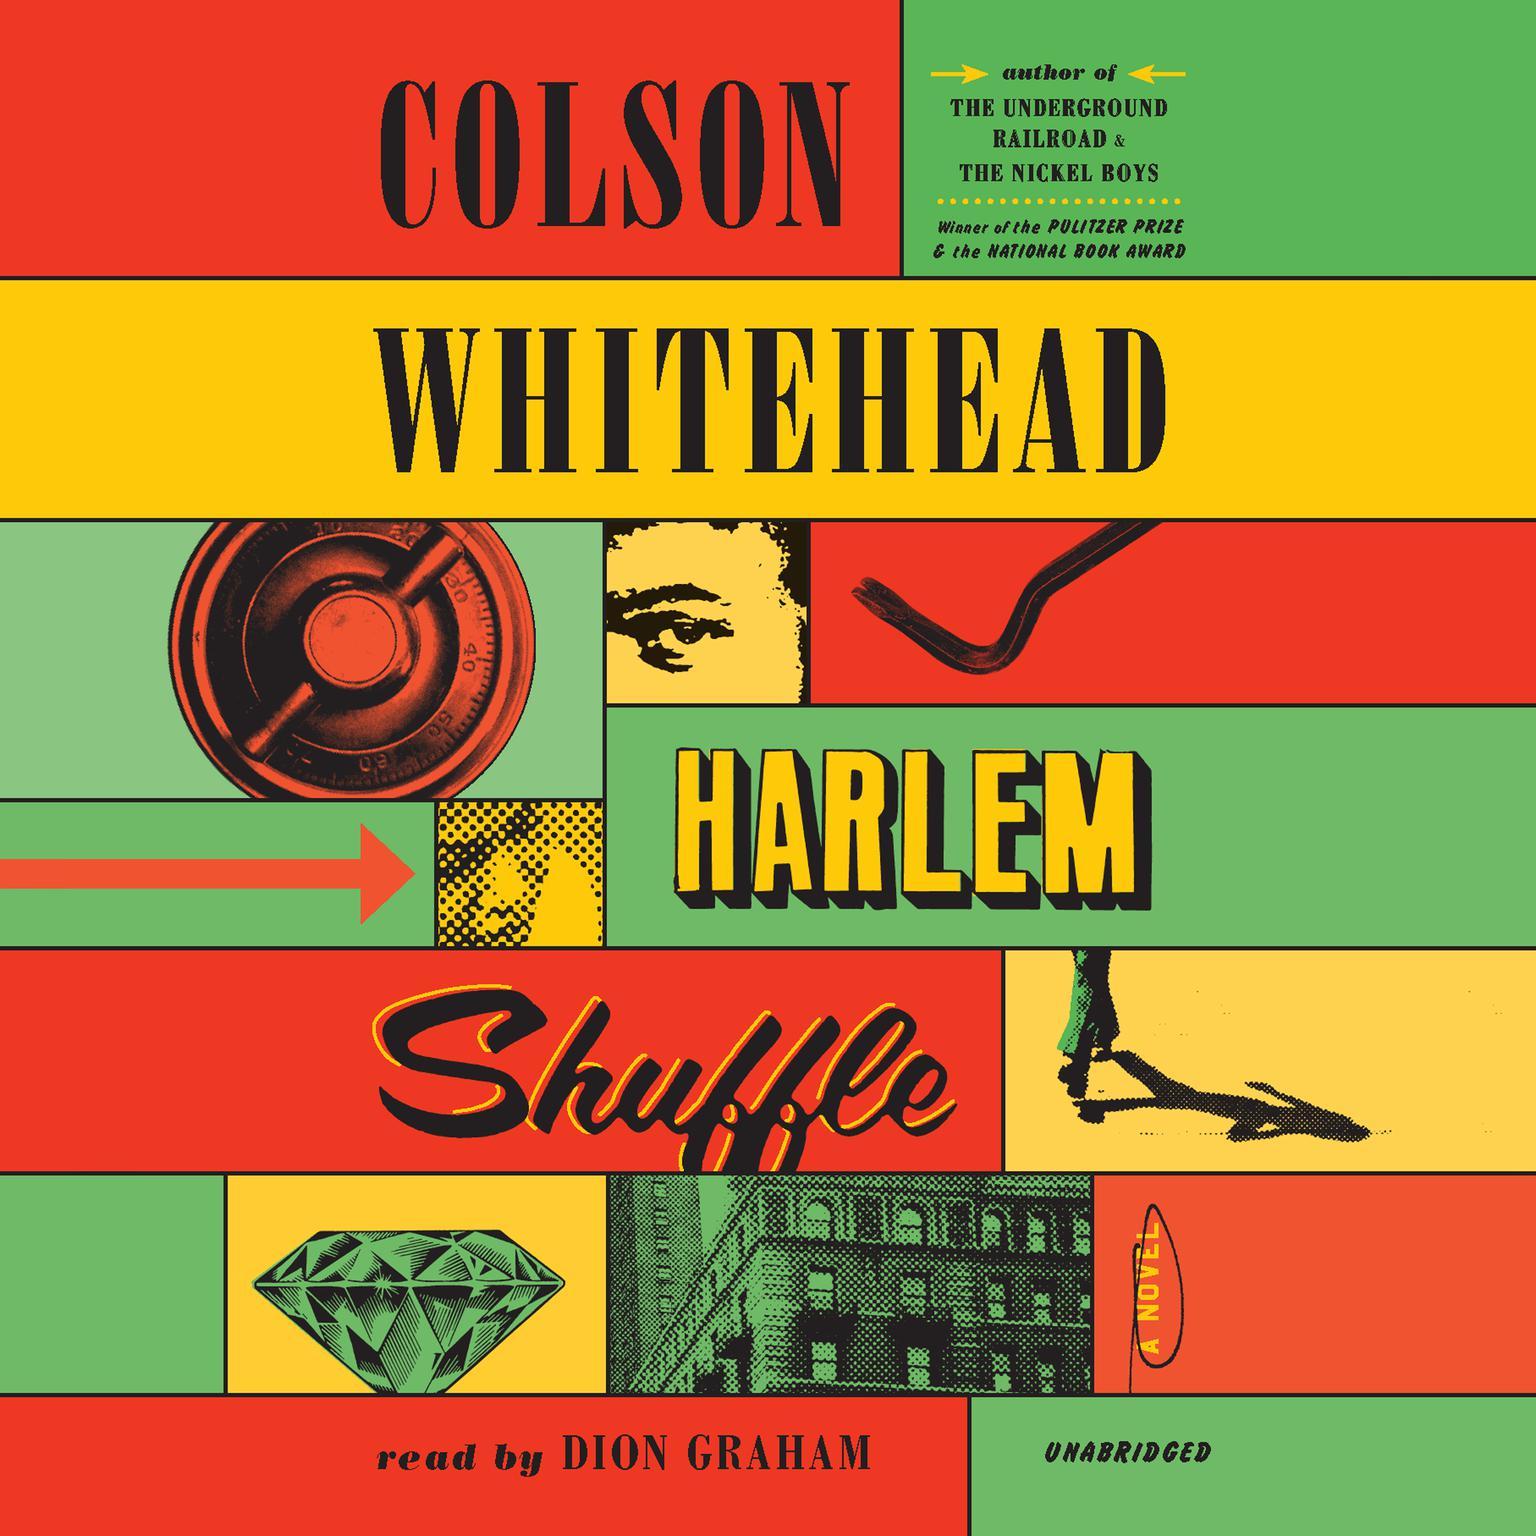 Harlem Shuffle: A Novel Audiobook, by Colson Whitehead